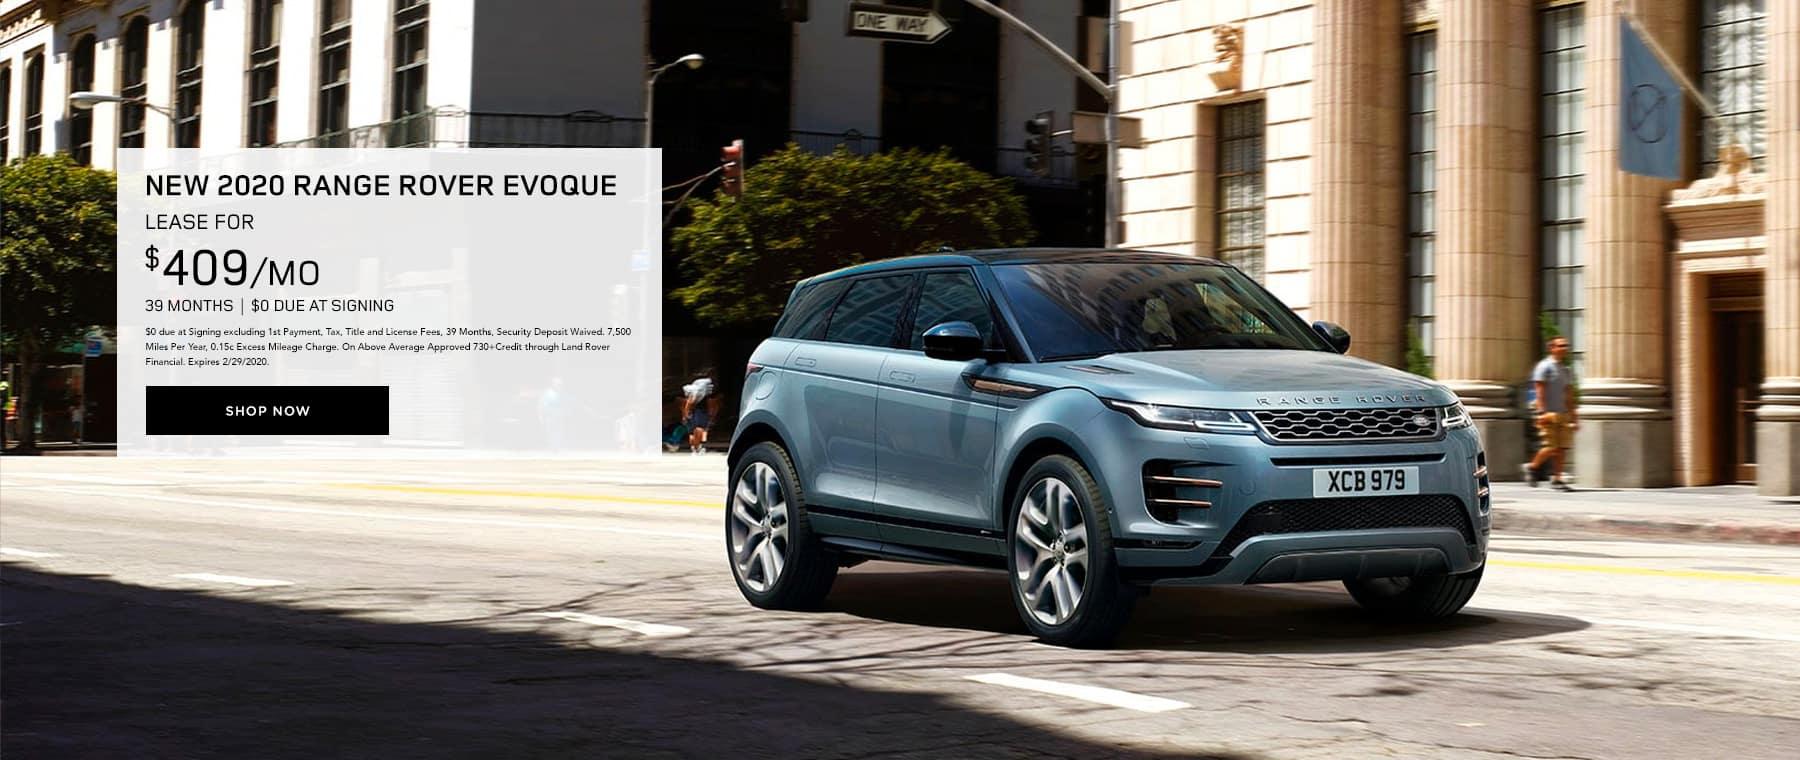 Lease Range Rover Evoque